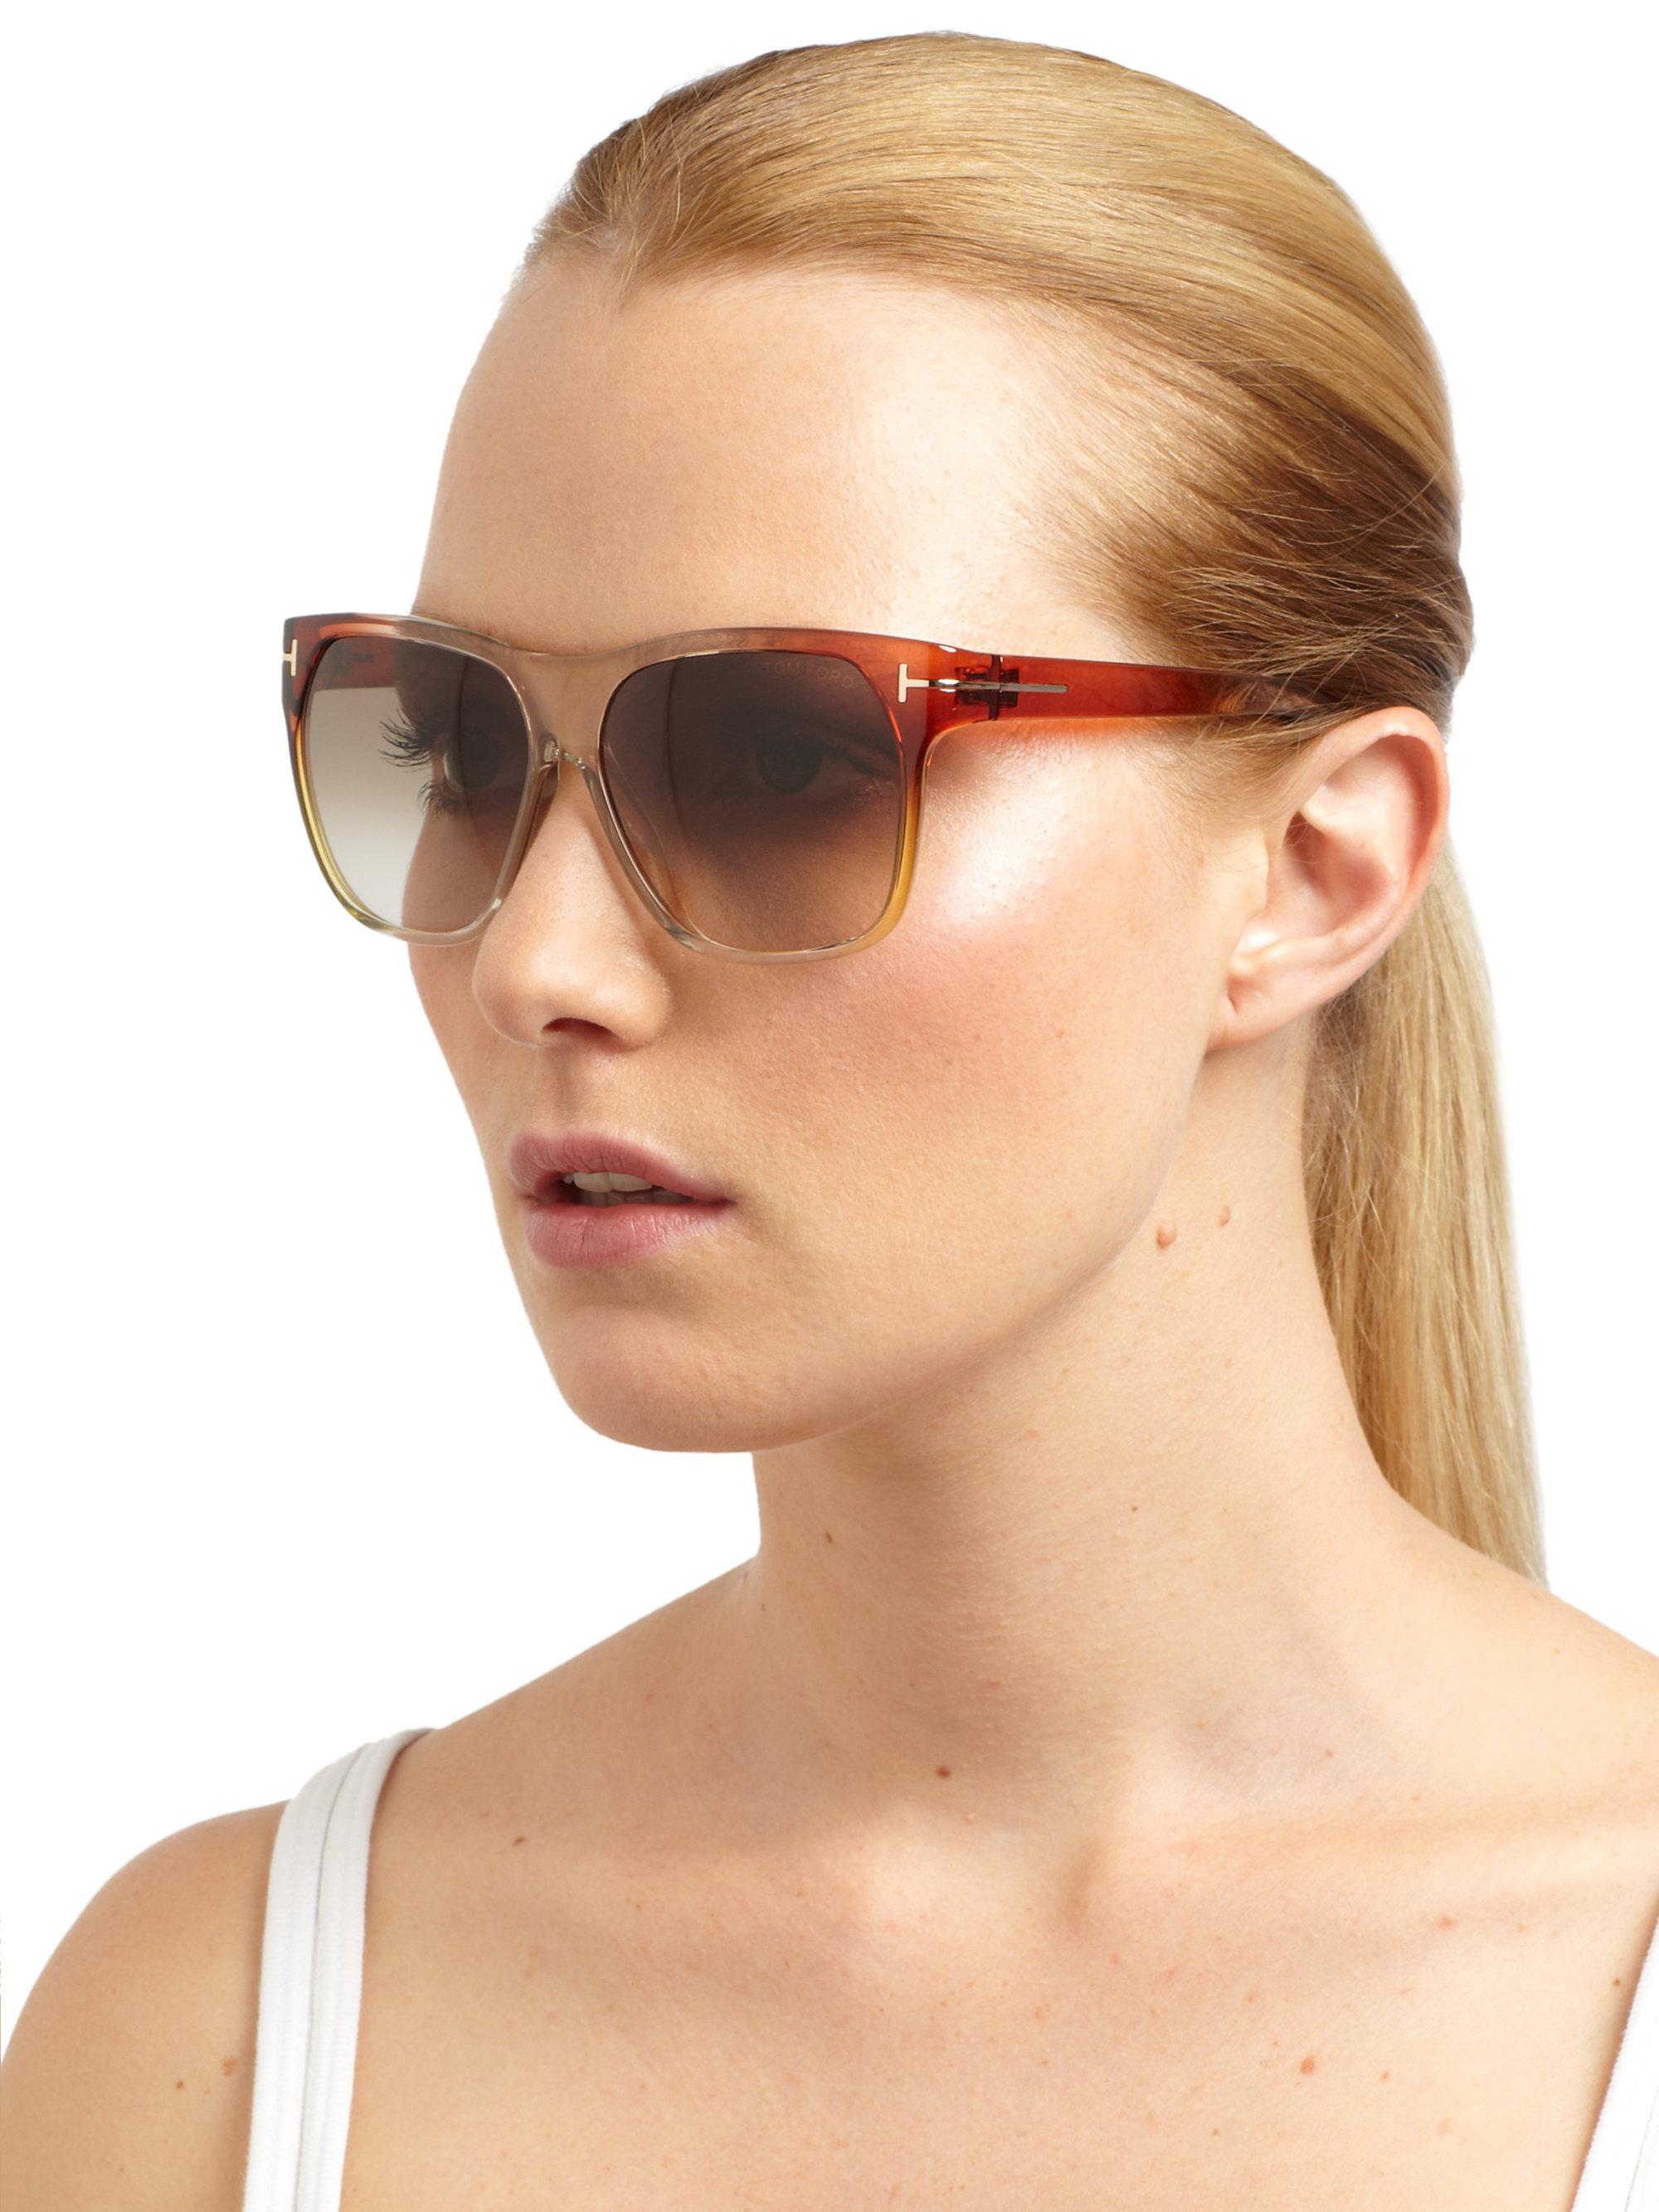 lyst tom ford frederico wayfarer sunglasses in brown. Black Bedroom Furniture Sets. Home Design Ideas